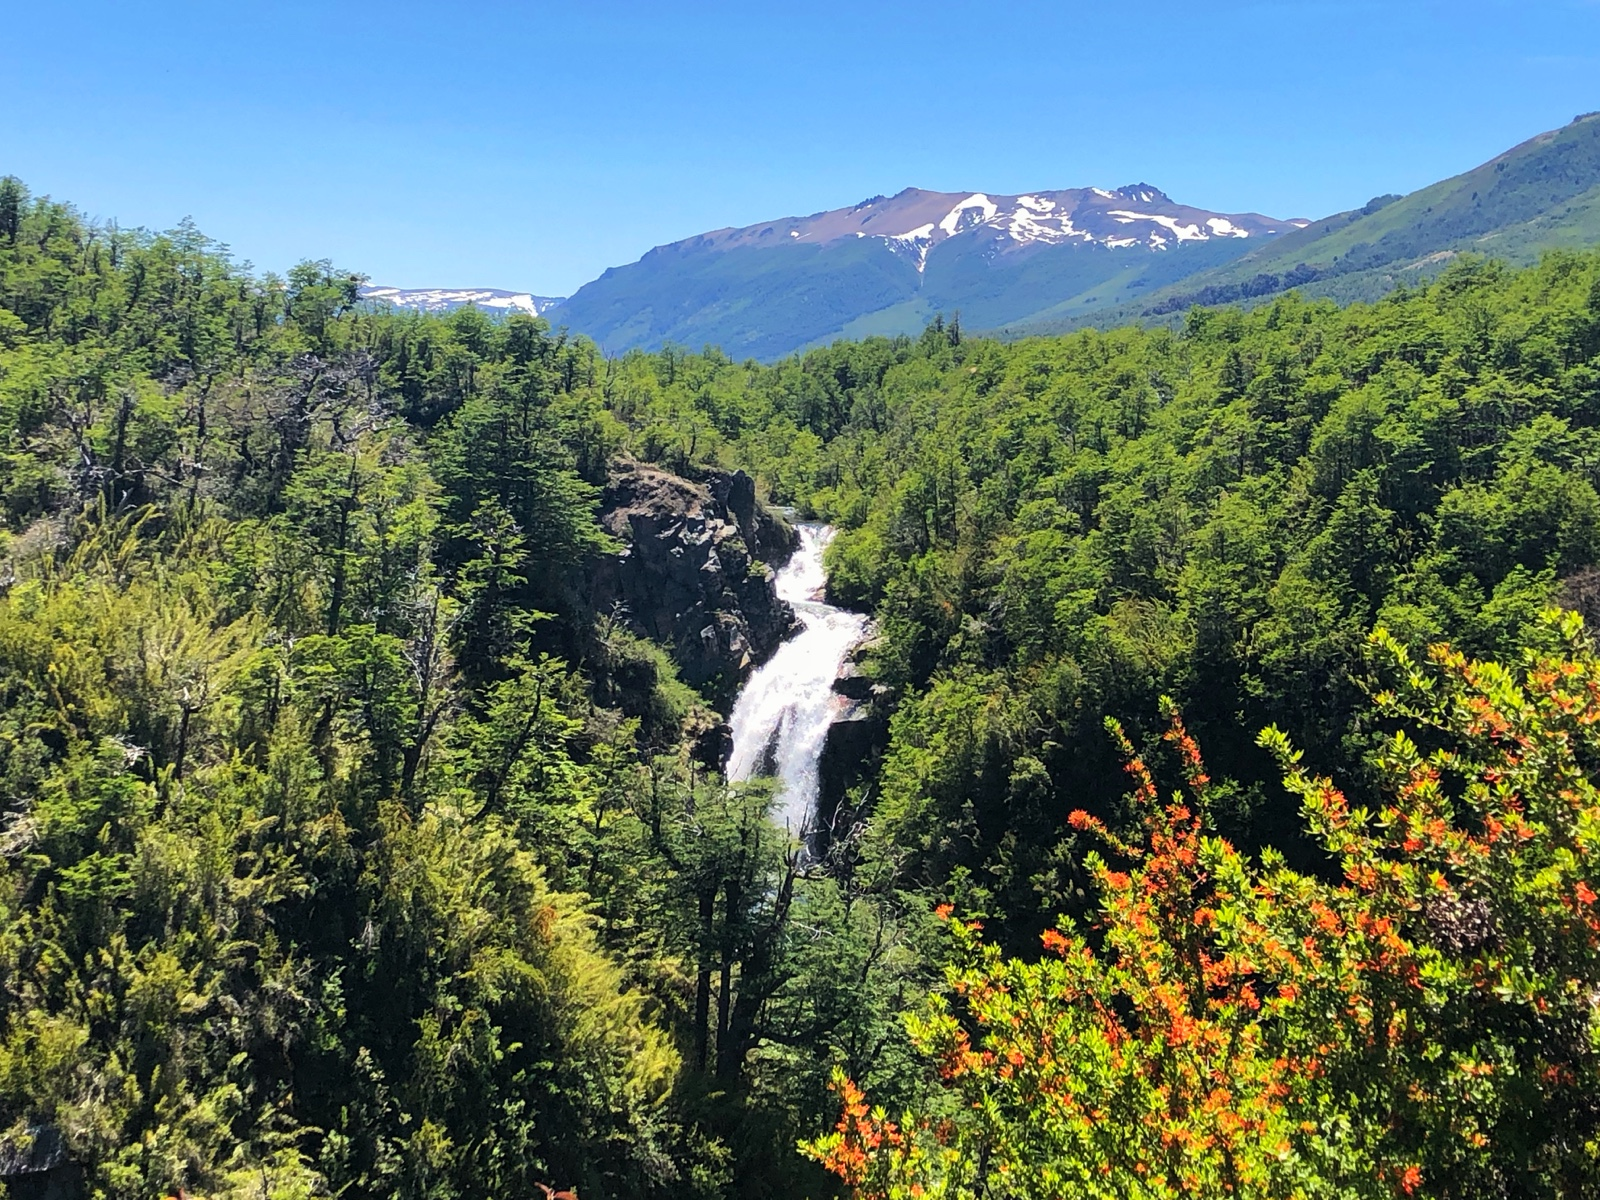 Cascada Vulliglianco